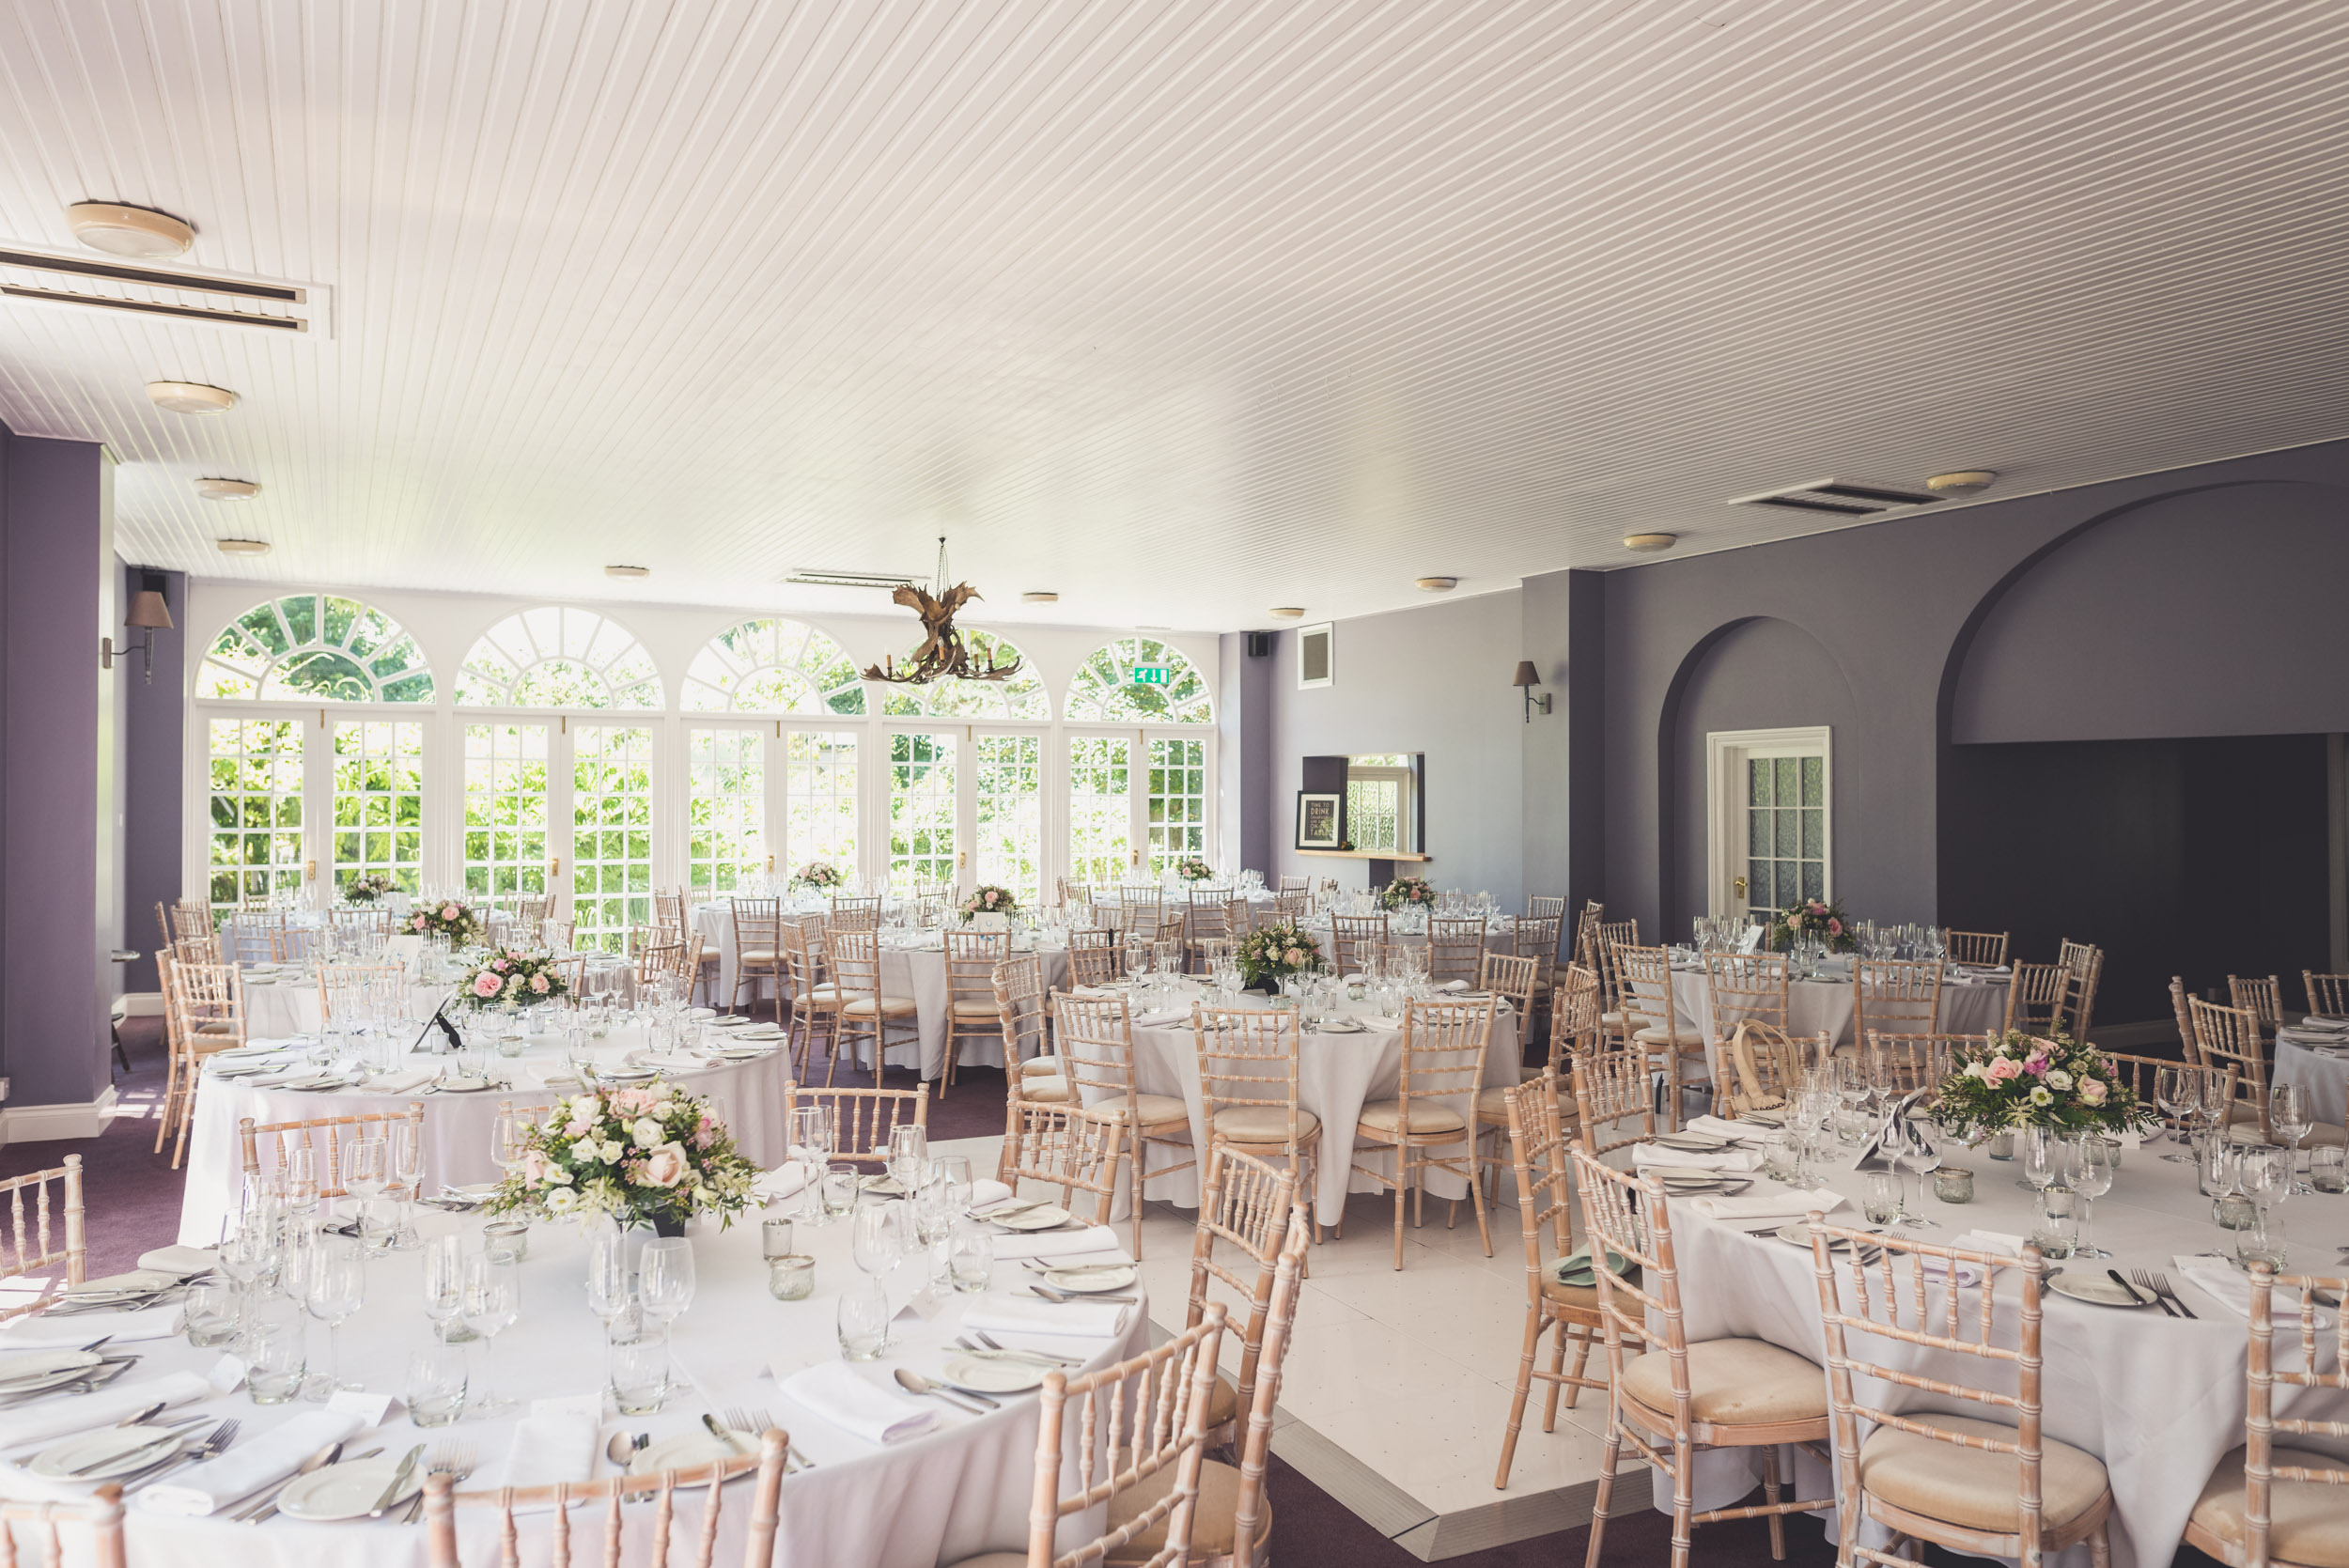 Needle thread bridesmaids dresses elegant country house wedding in elegant wedding decor junglespirit Gallery